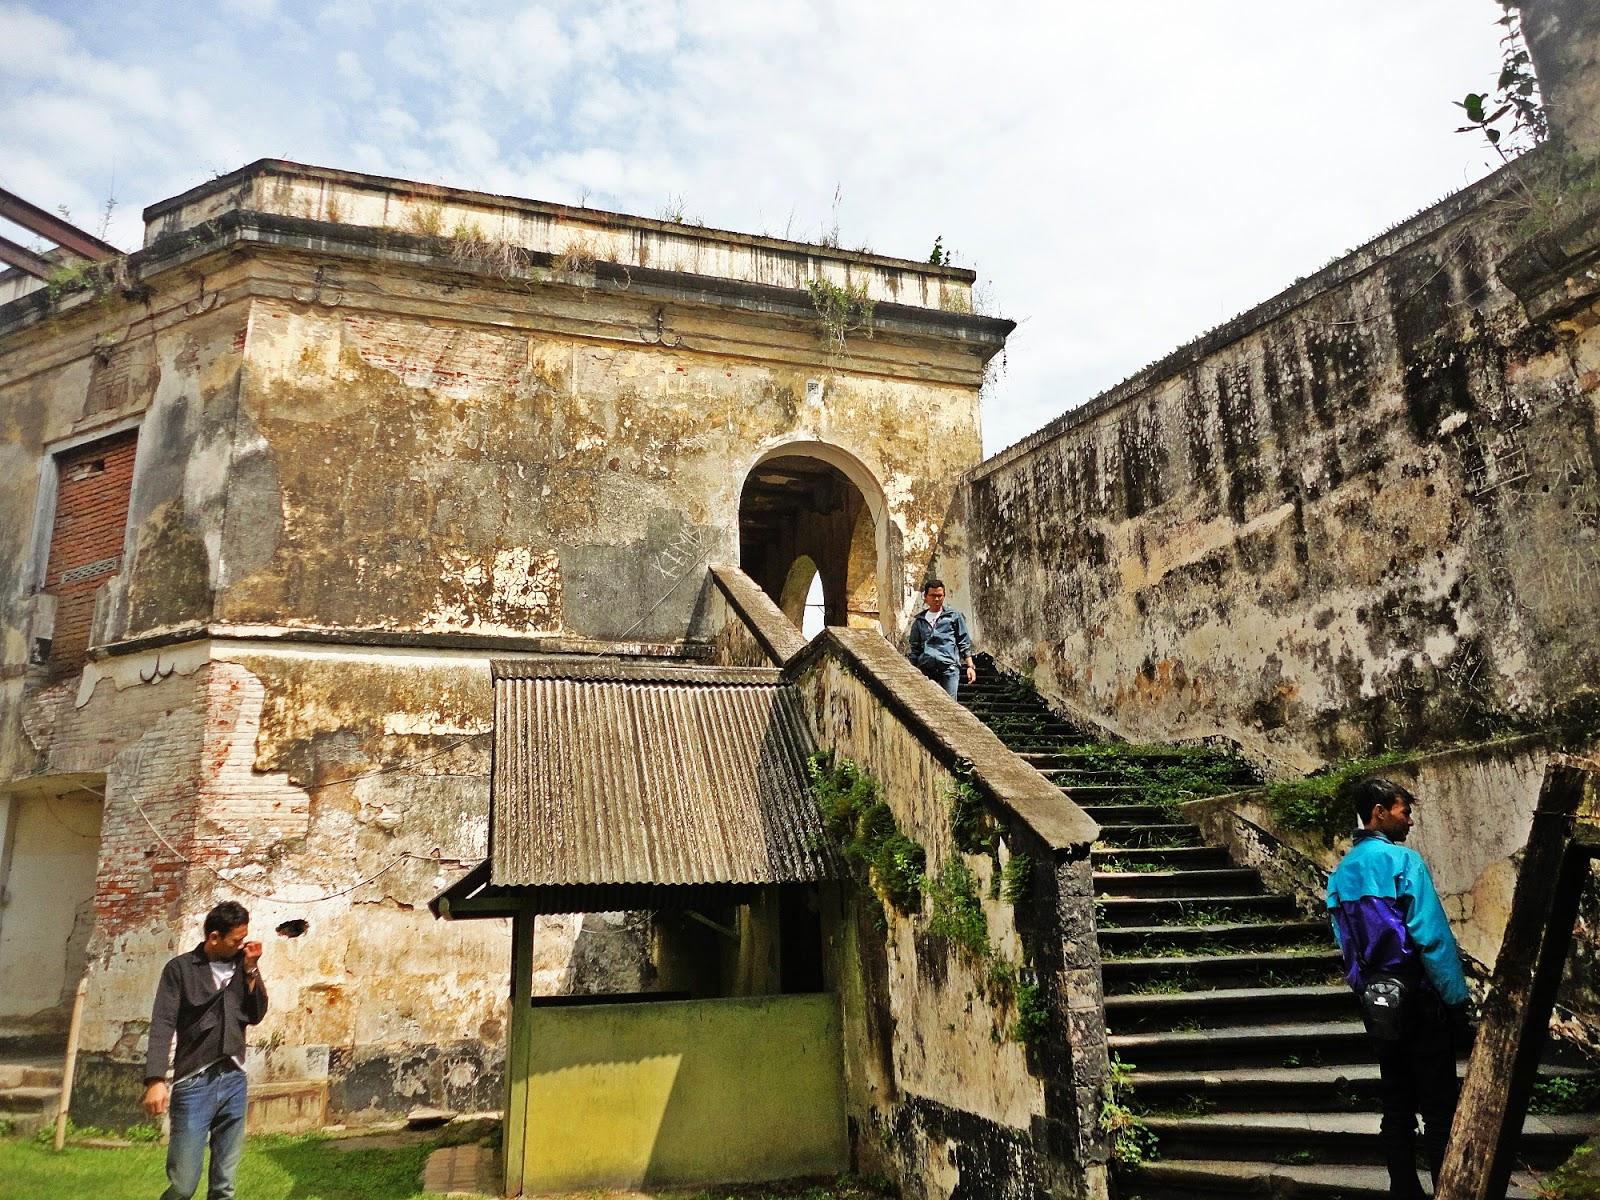 Fatkhi Aldiansyah Benteng Van Den Bosch Kab Ngawi